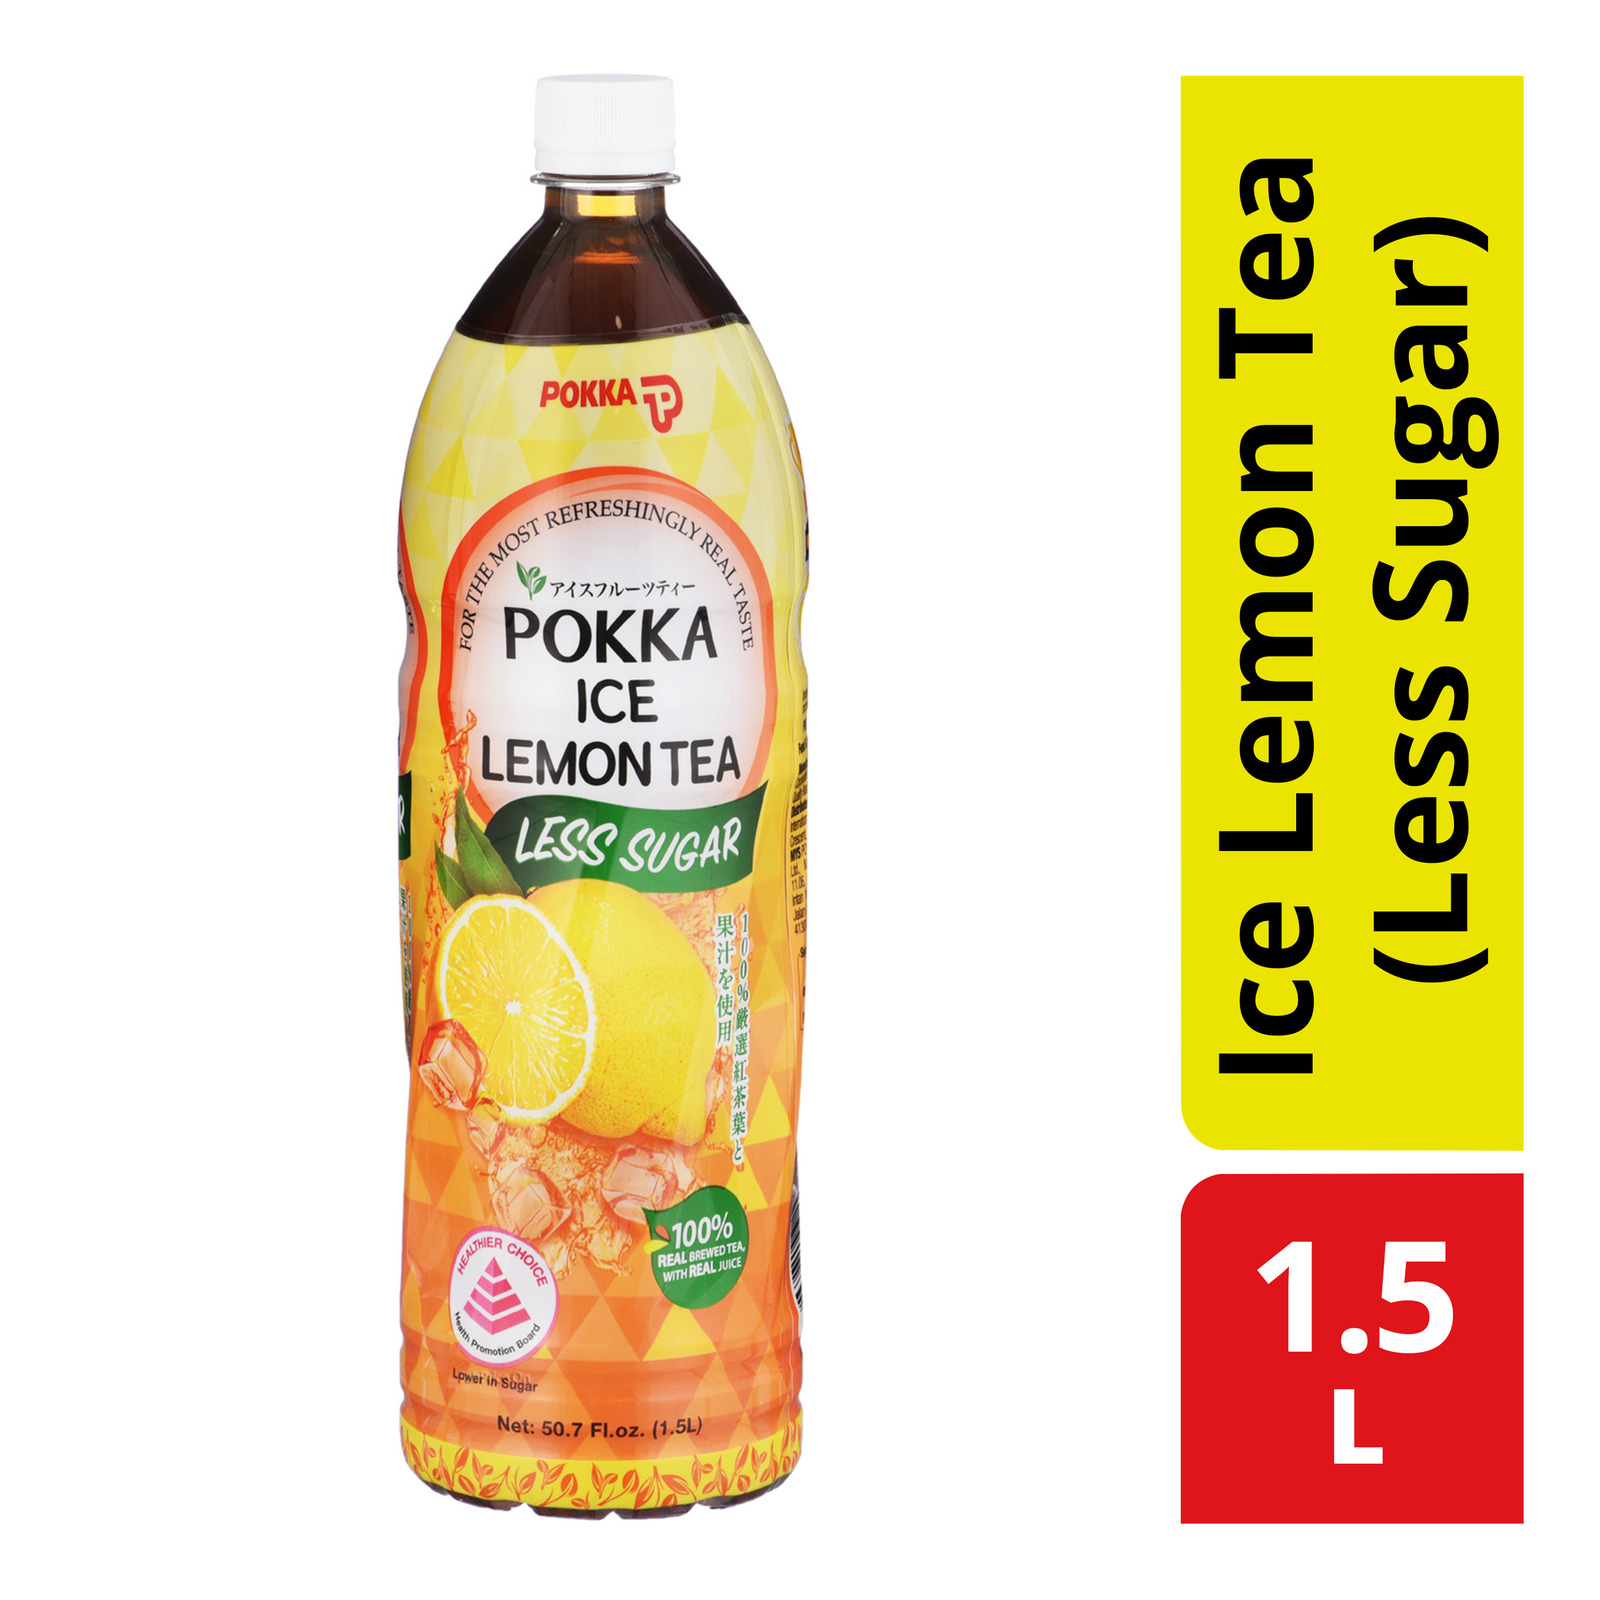 Pokka Bottle Drink - Ice Lemon Tea (Less Sugar)